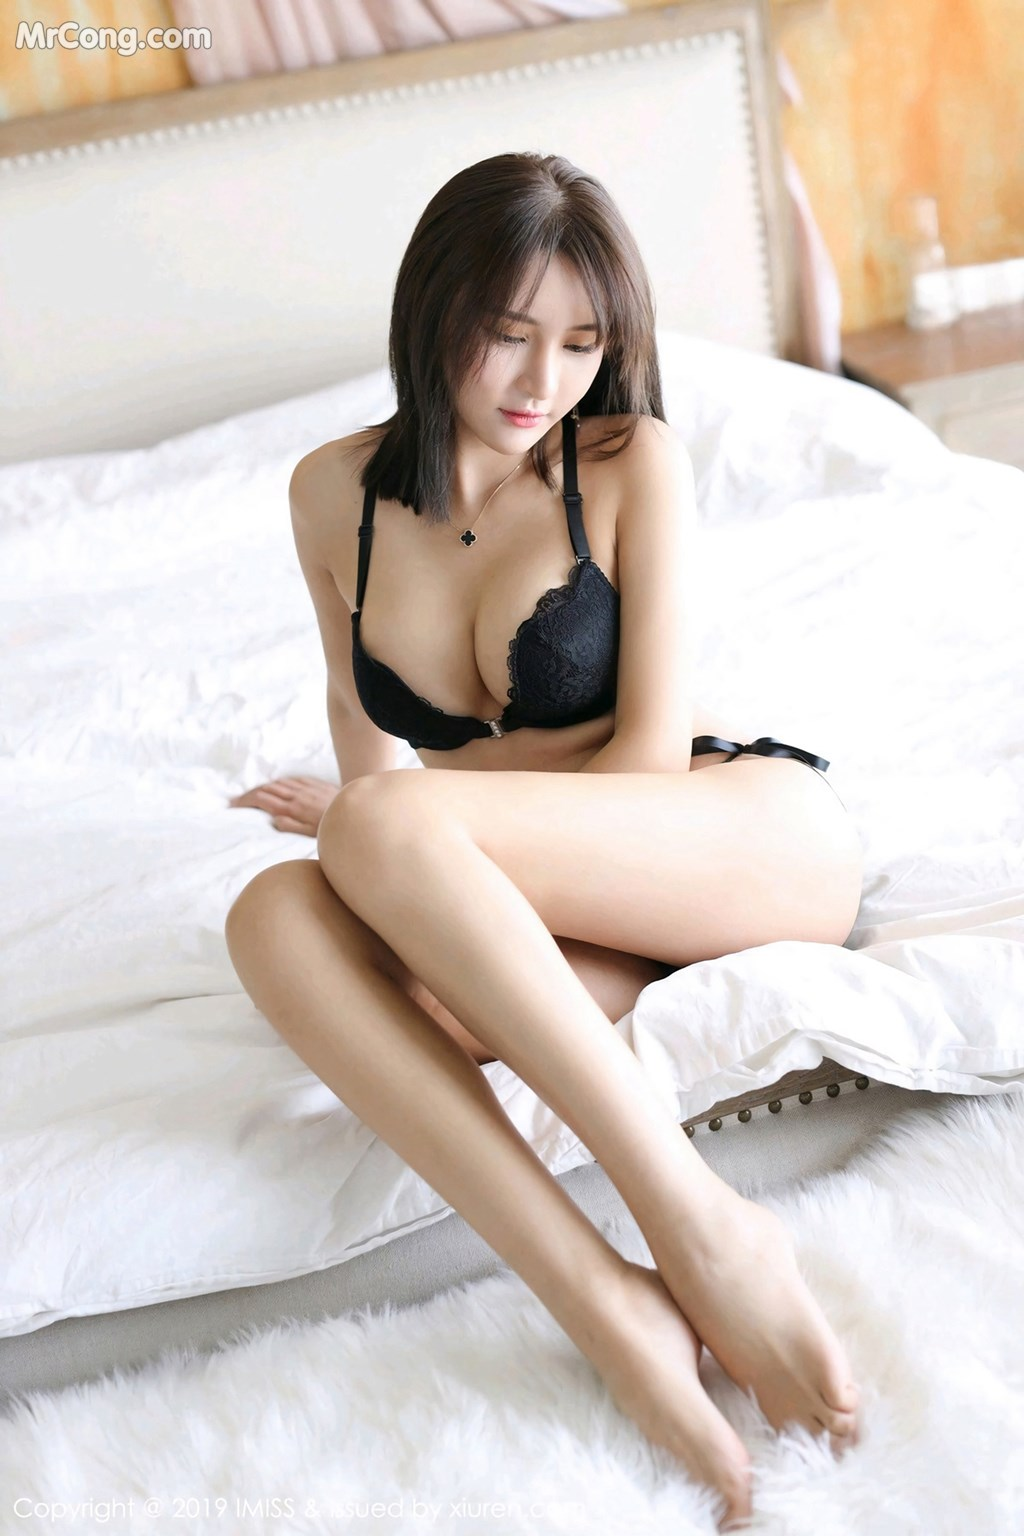 Image IMISS-Vol.329-SOLO-MrCong.com-002 in post IMISS Vol.329: Người mẫu SOLO-尹菲 (42 ảnh)